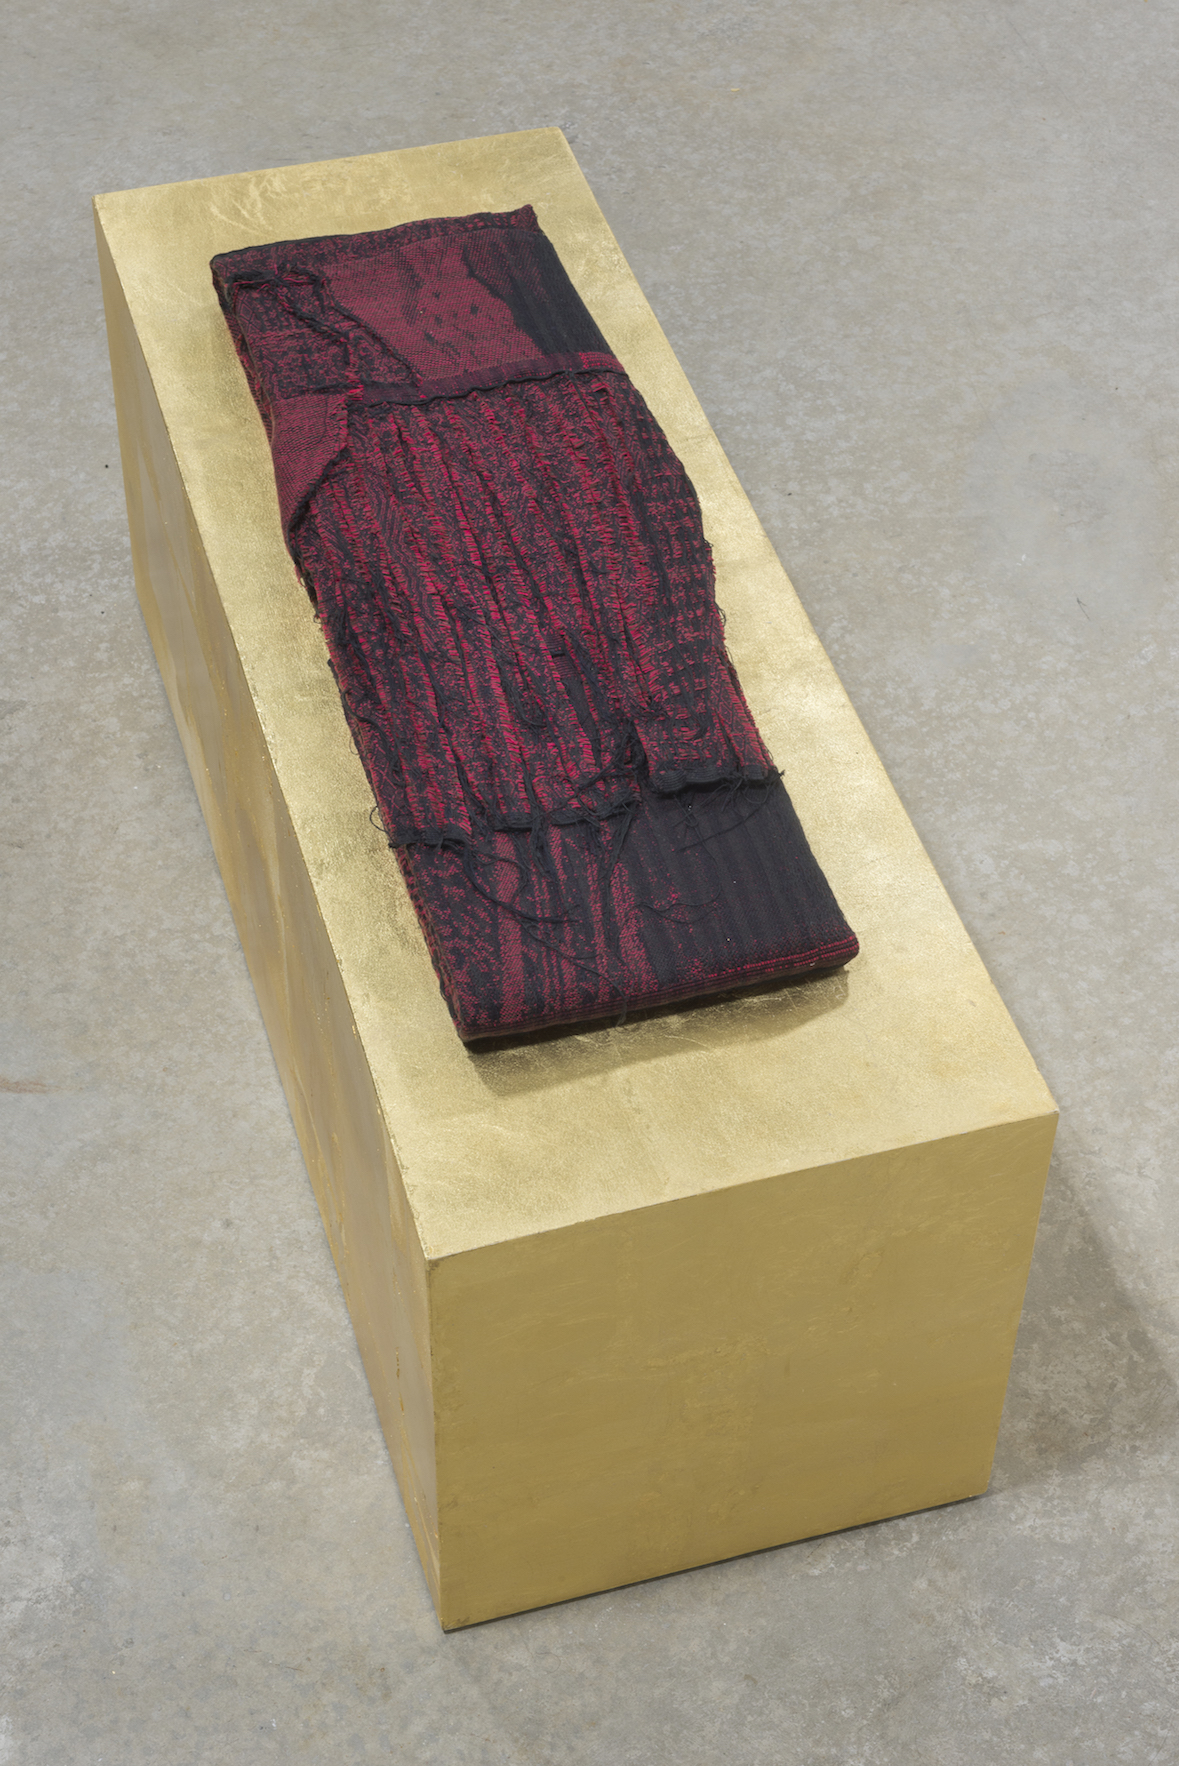 "Sacred Cloth I  (cloth folded) 11"" X 26"" (pedestal) 13"" X 36"" X 14,"" 2017, cotton, gold-leaf, & wood"